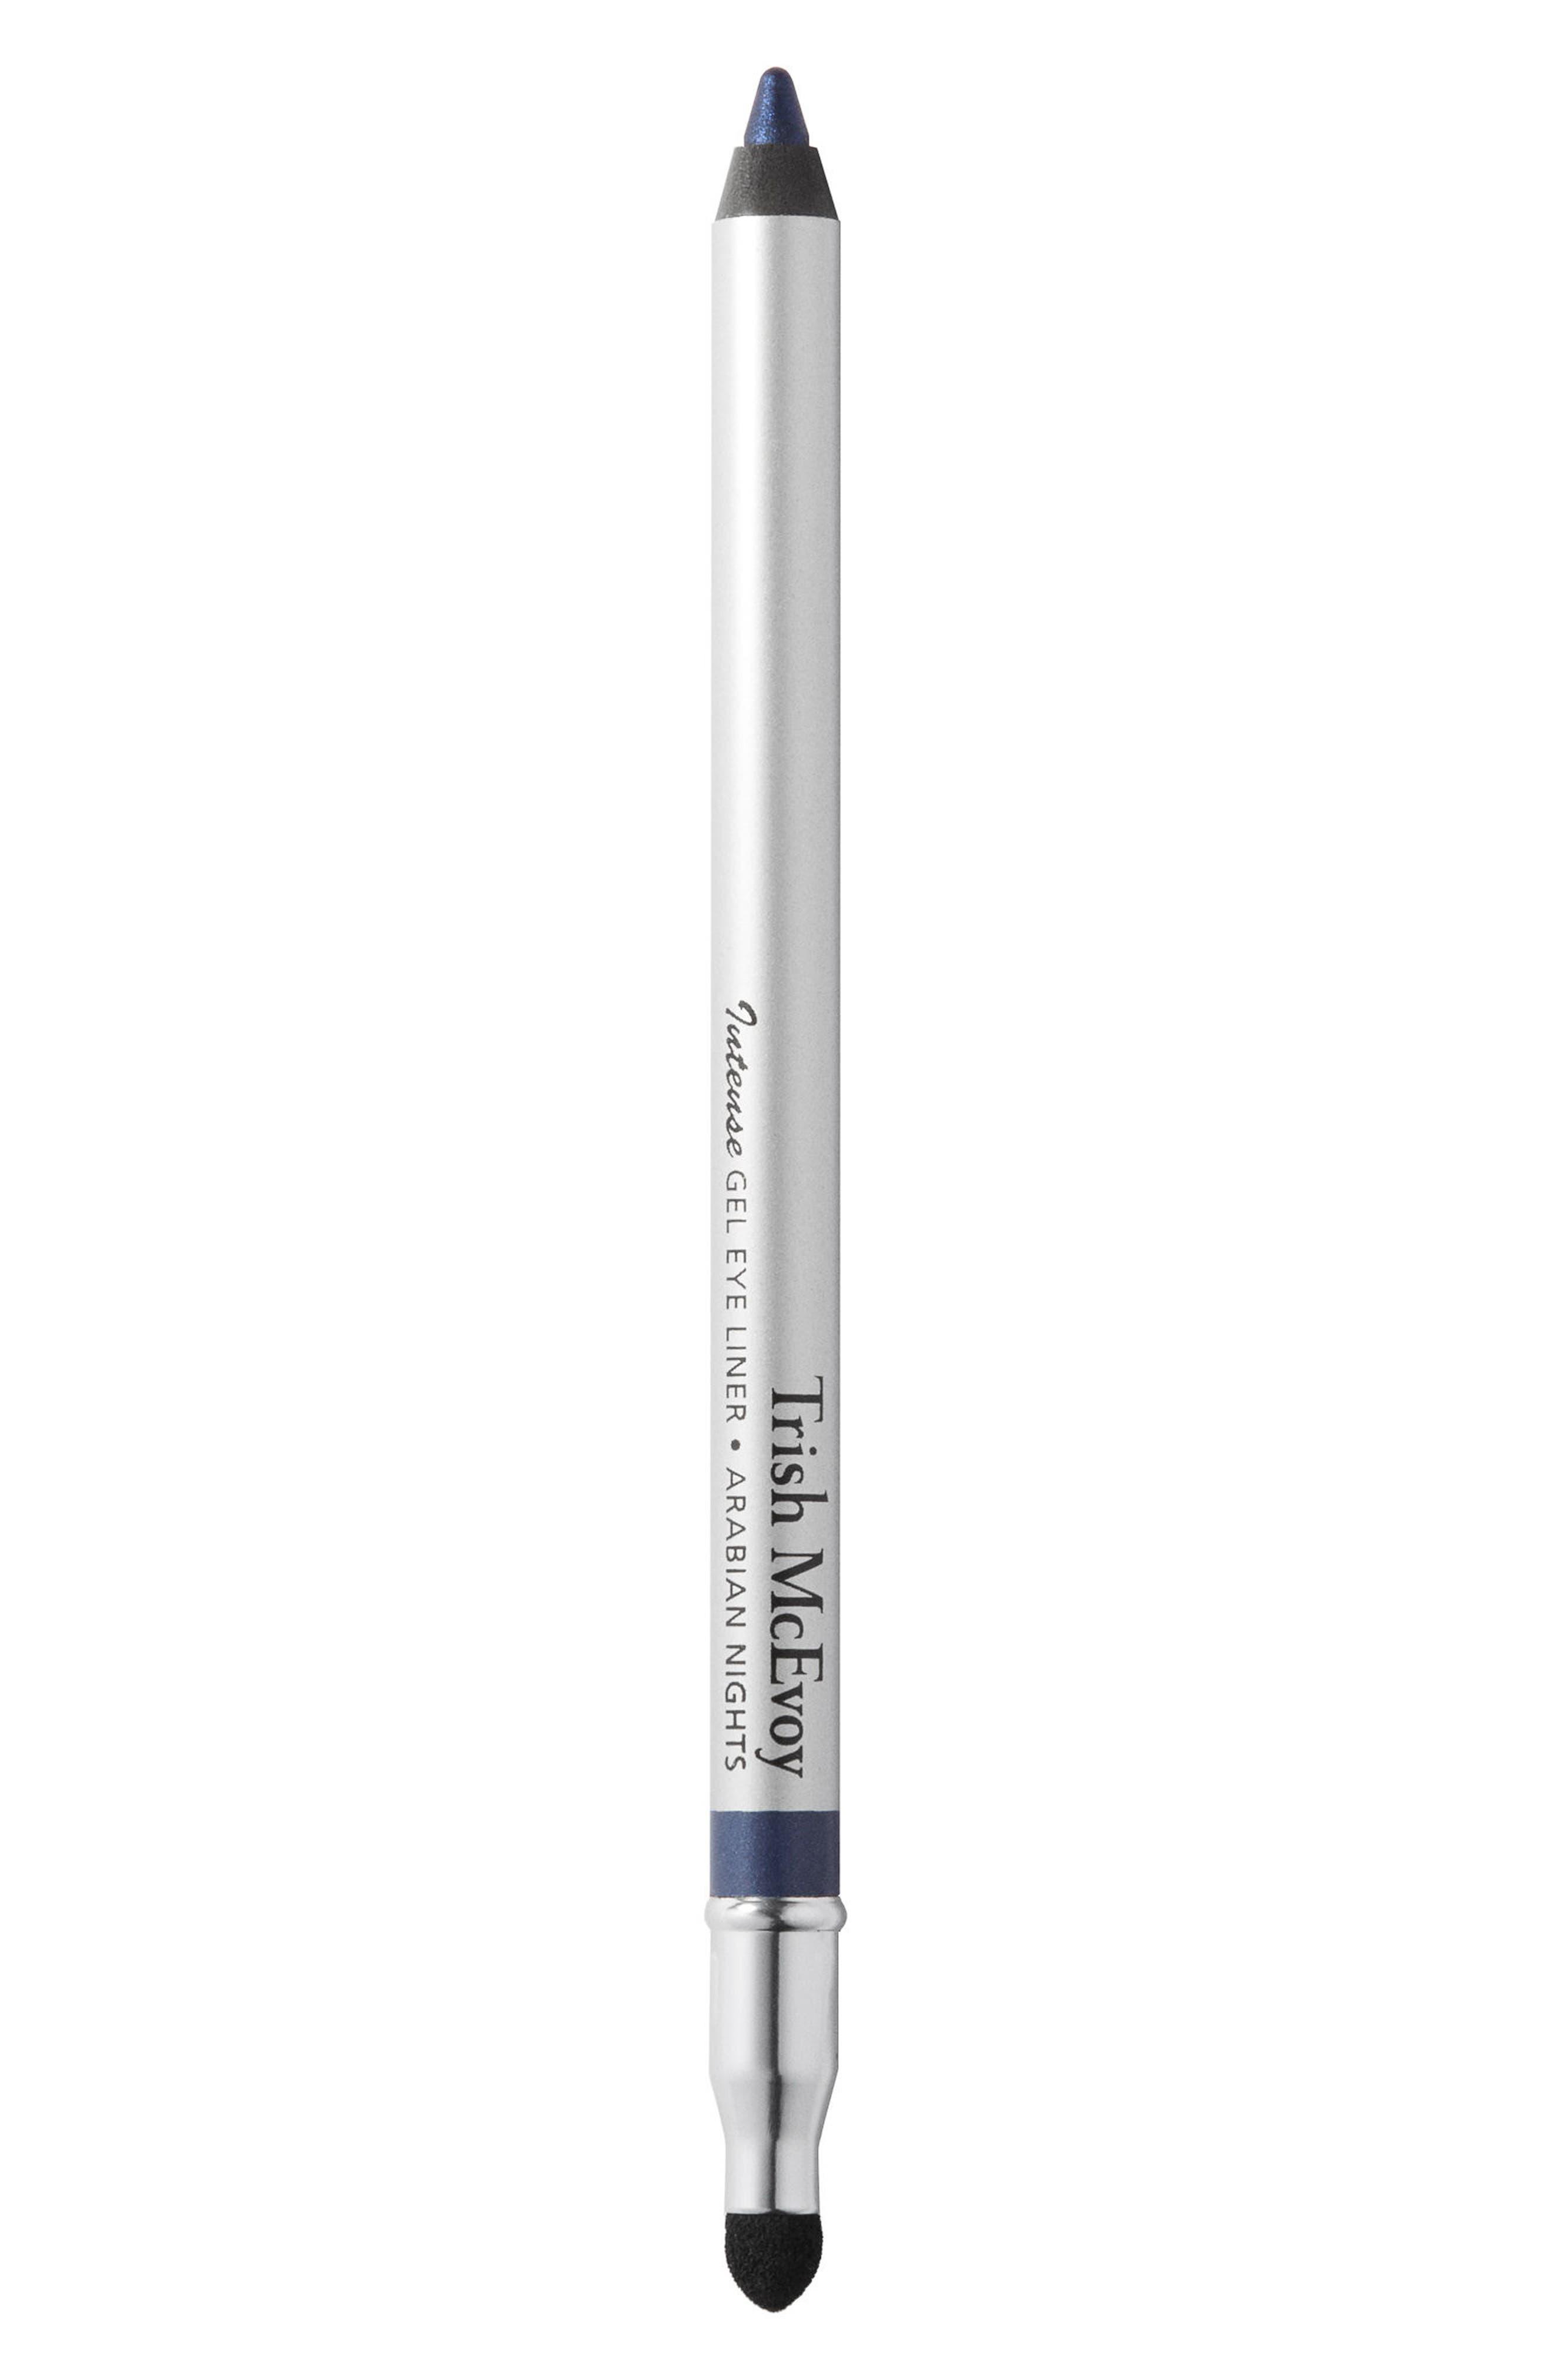 Alternate Image 1 Selected - Trish McEvoy Intense Gel Eyeliner Pencil